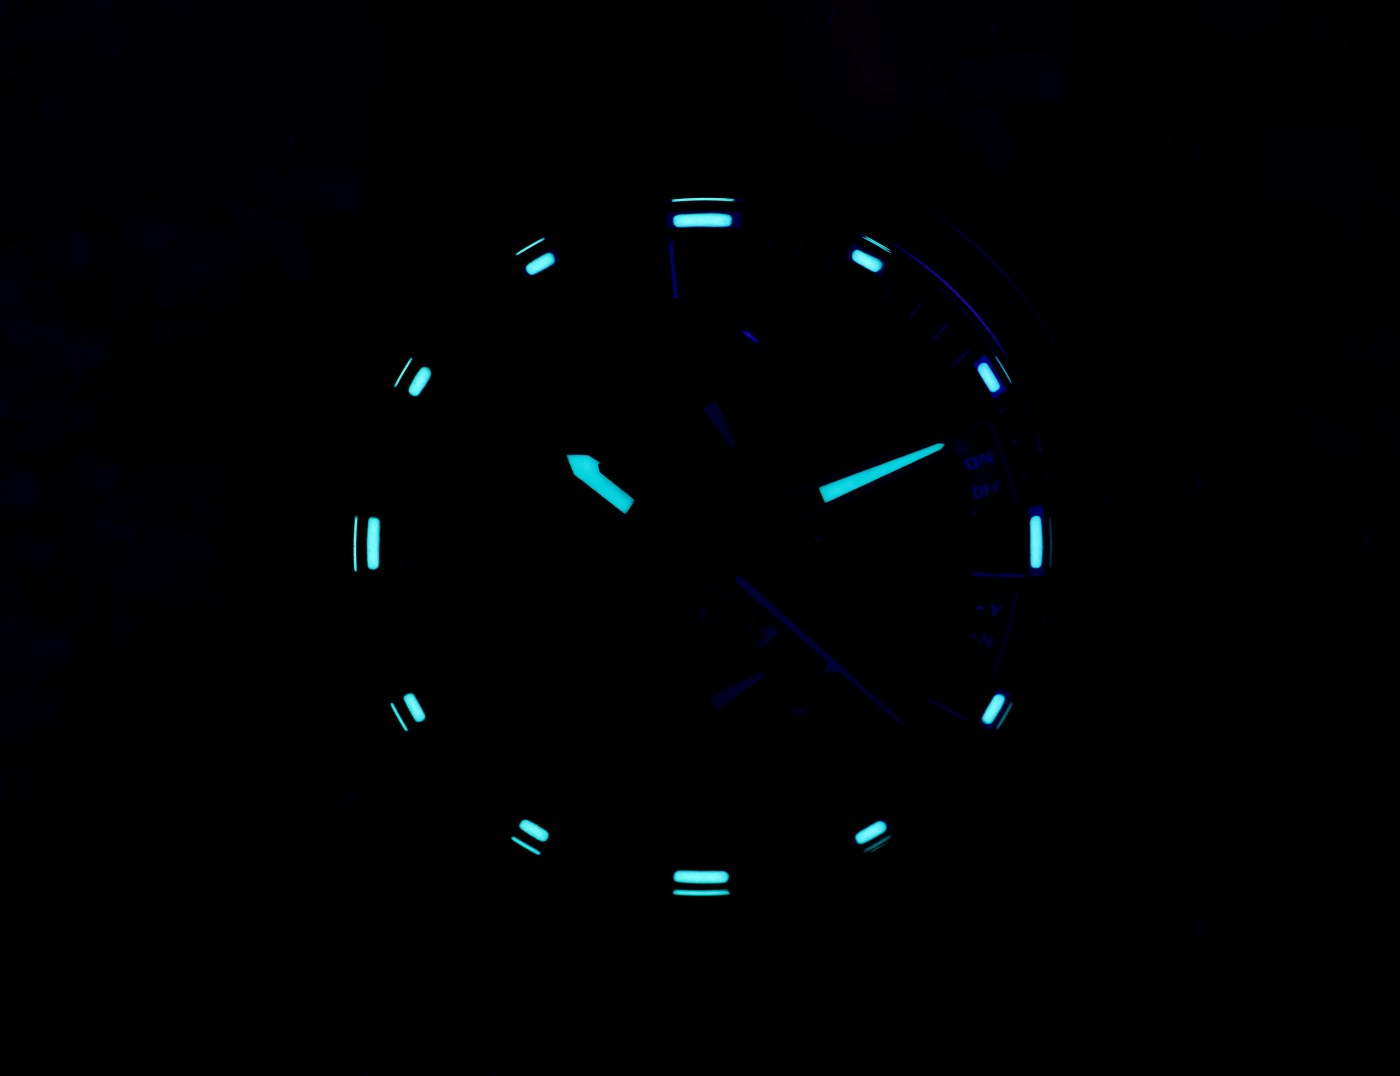 G-Shock MTGB1000XB de fibra de carbono ¡Lo probamos! 6